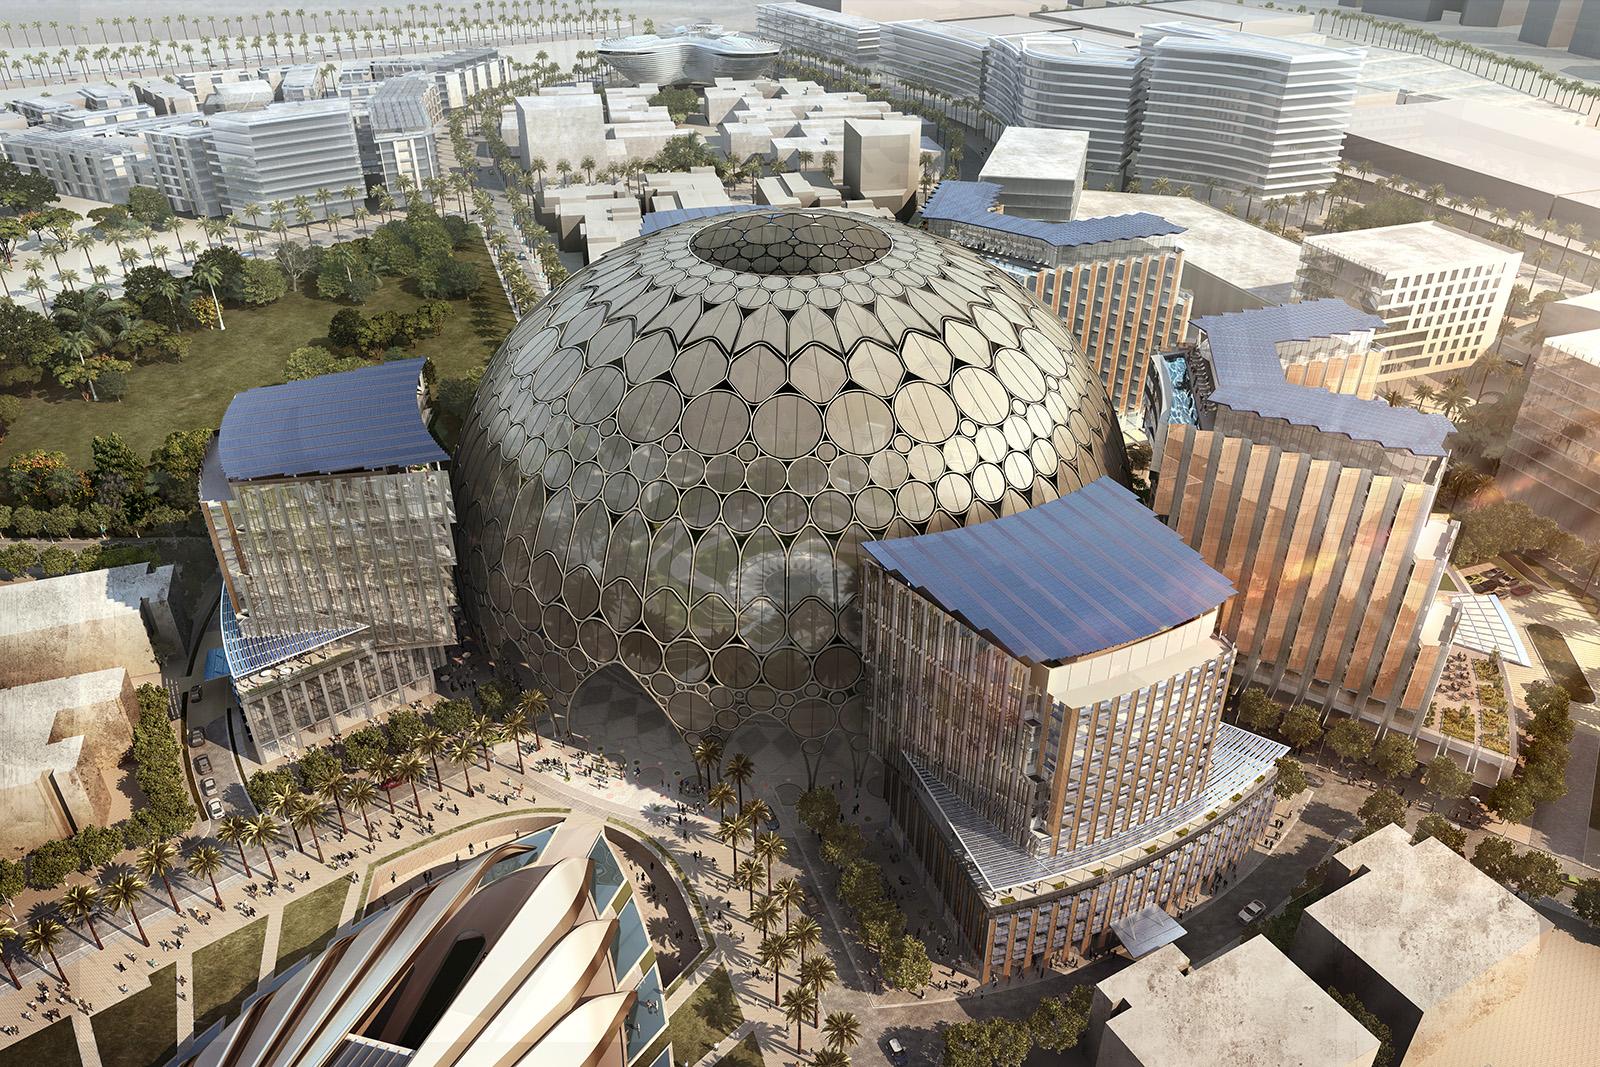 Al Wasl Plaza, Expo 2020